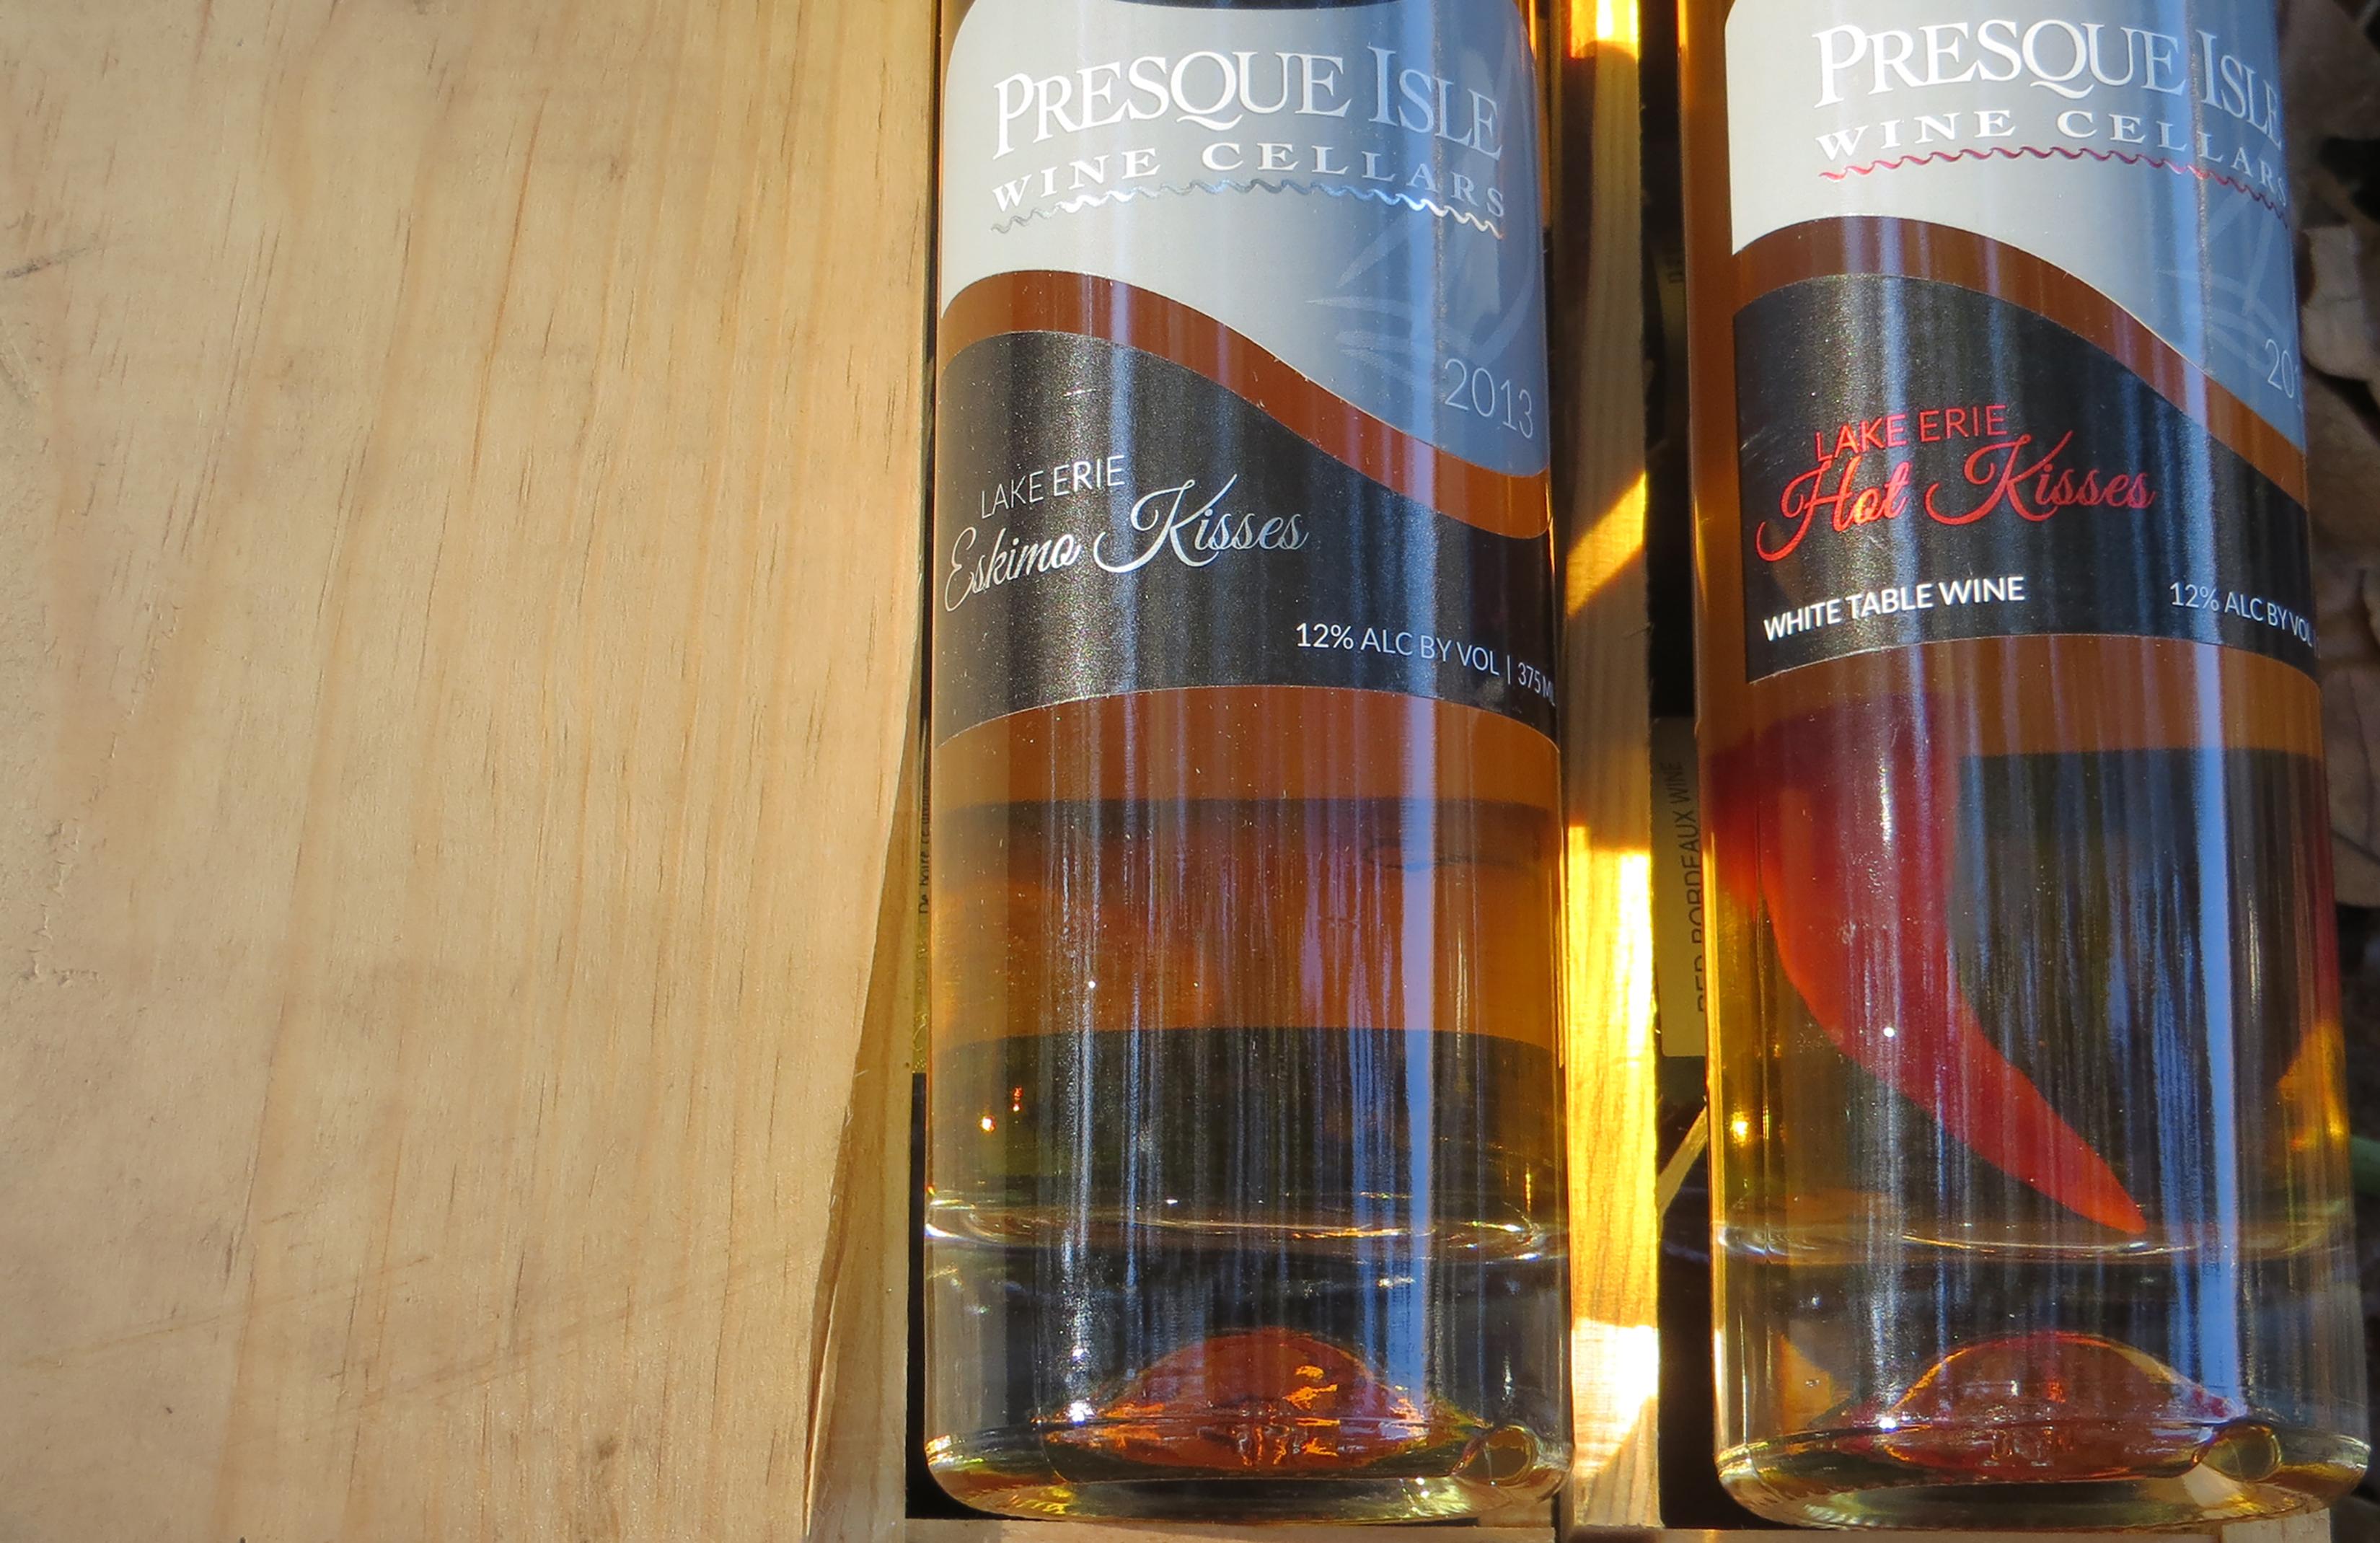 Kisses Wines at Presque Isle Wine Cellars